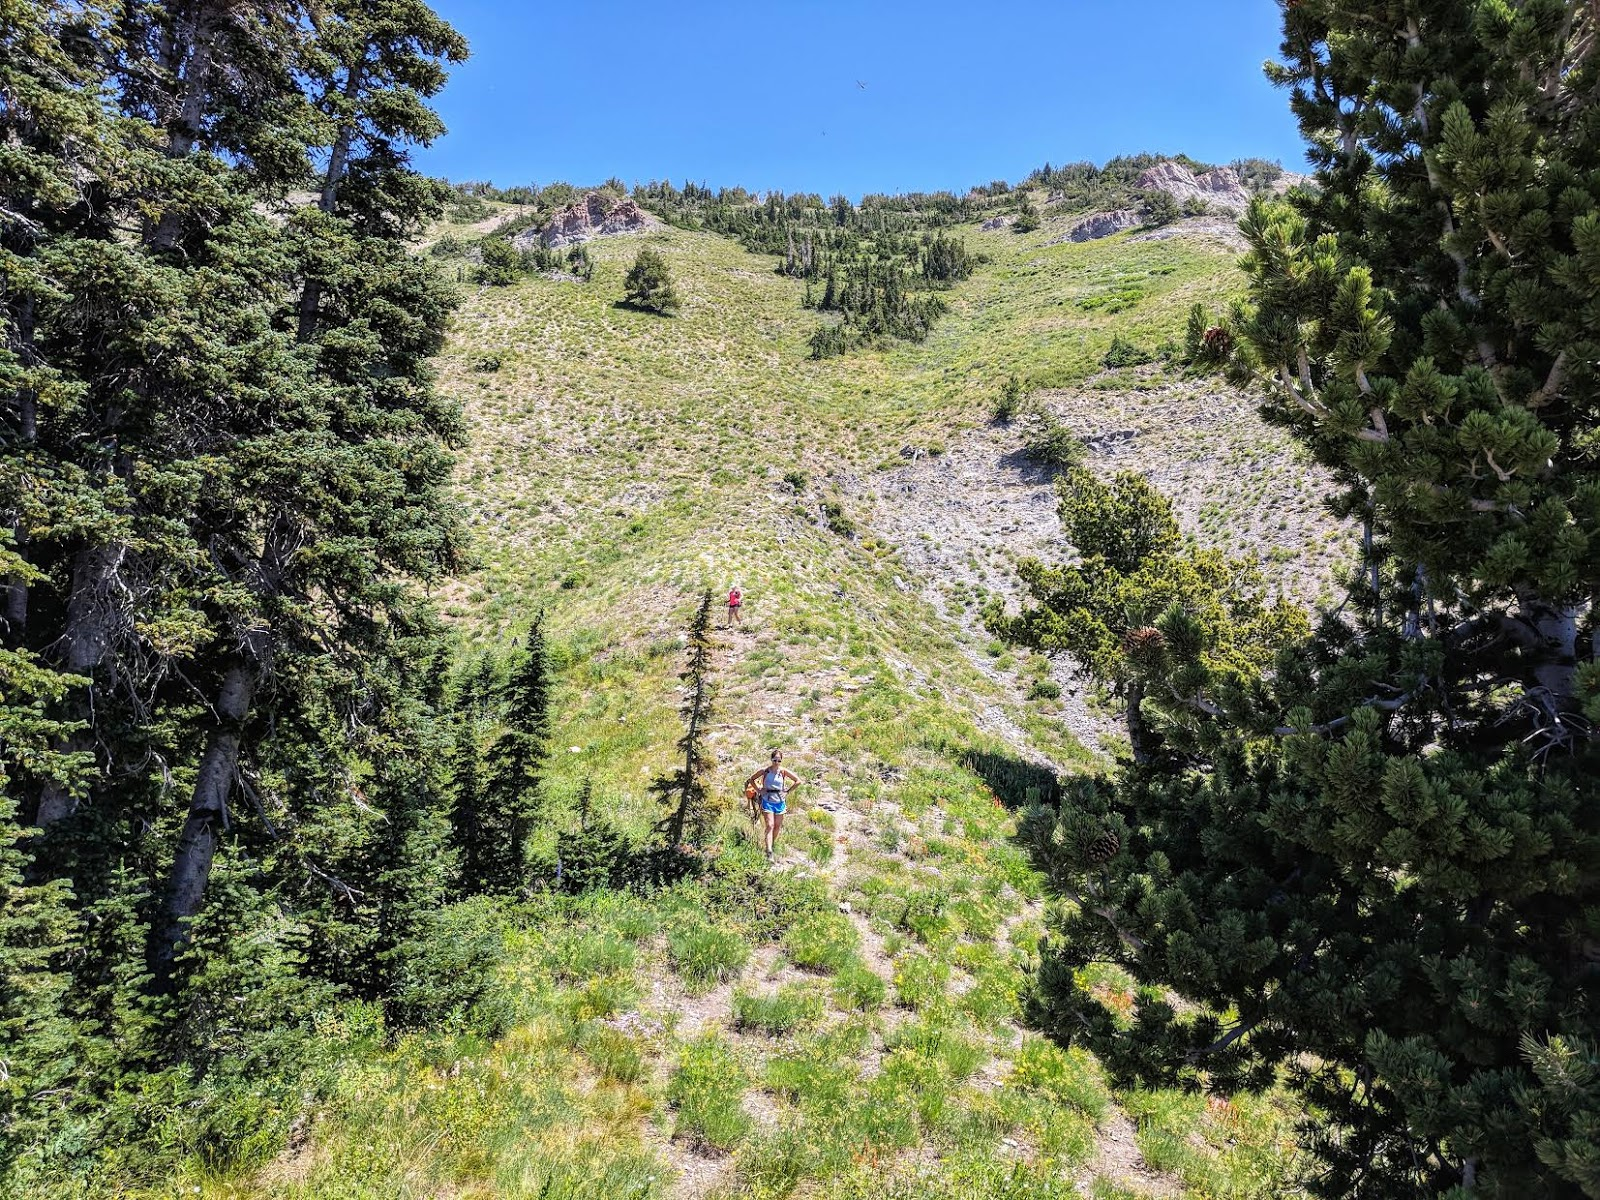 Hiking to Cascade Mountain, Hiking Hiking to Cascade Peak above Provo, Utah, Hiking the Wasatch 7 Peaks, Utah Peak Baggers, Wasatch Peak Baggers